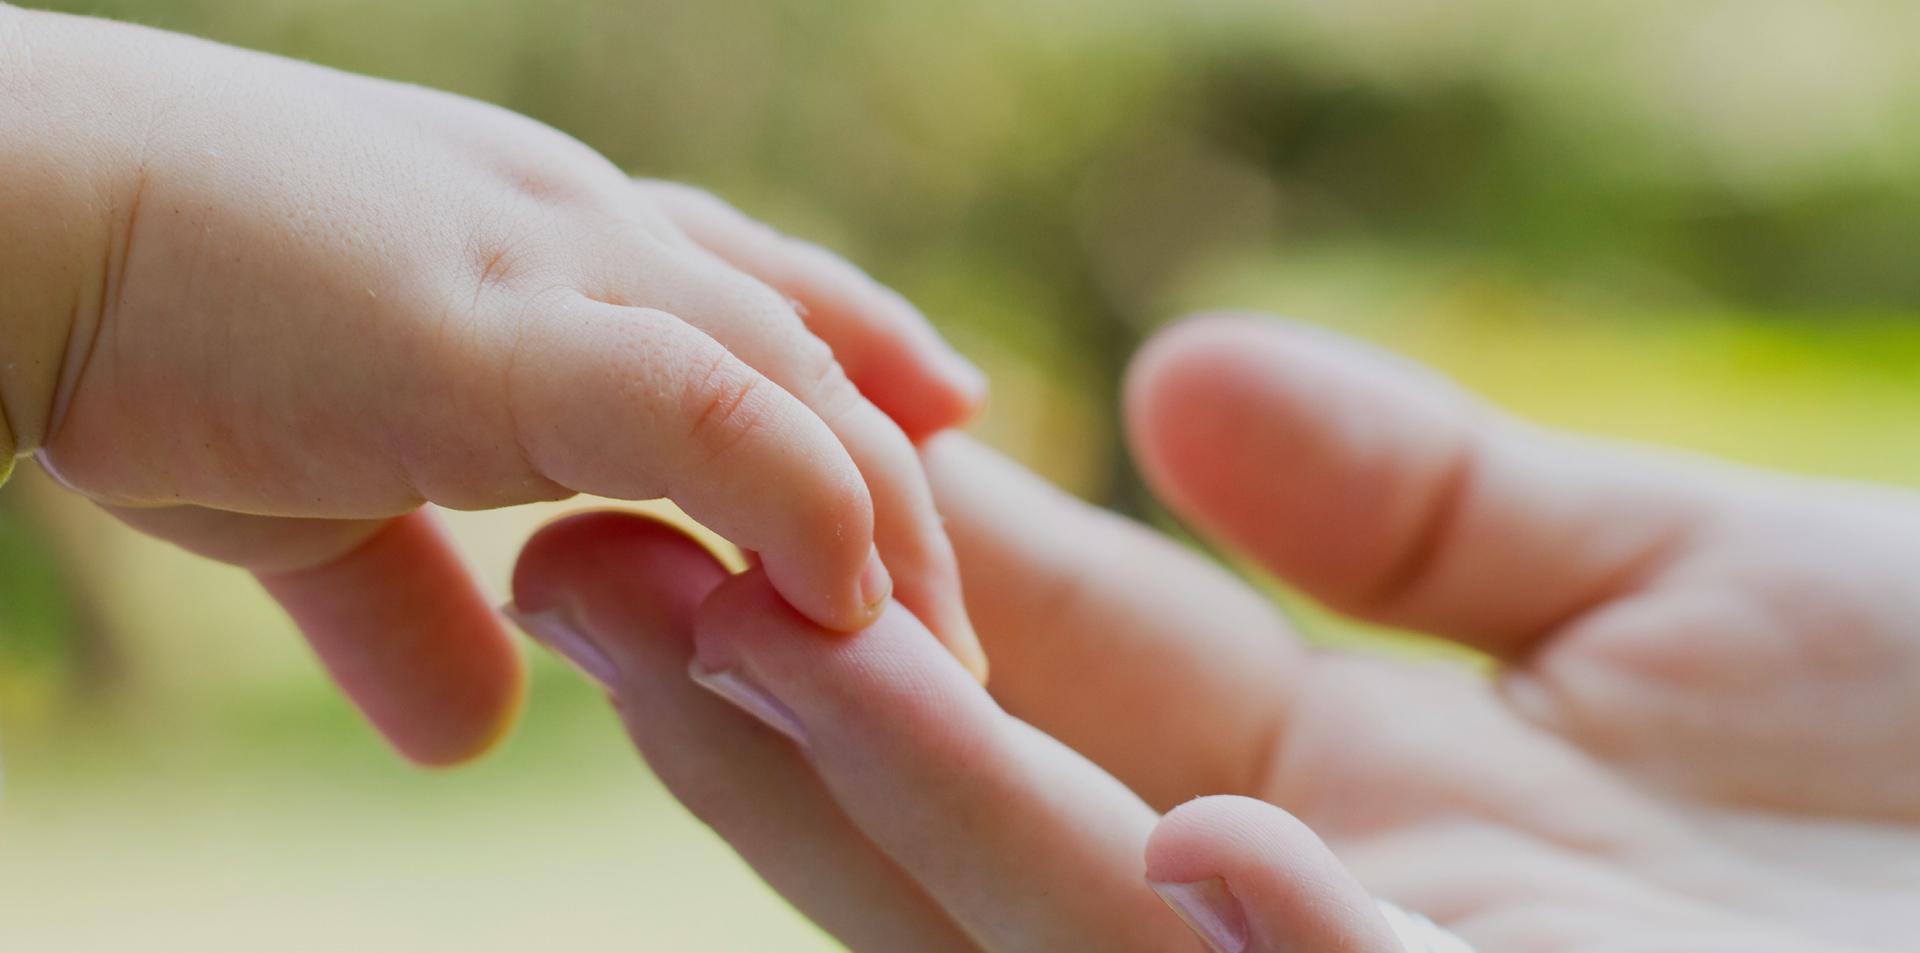 napier-fmaily-centre-holding-hands